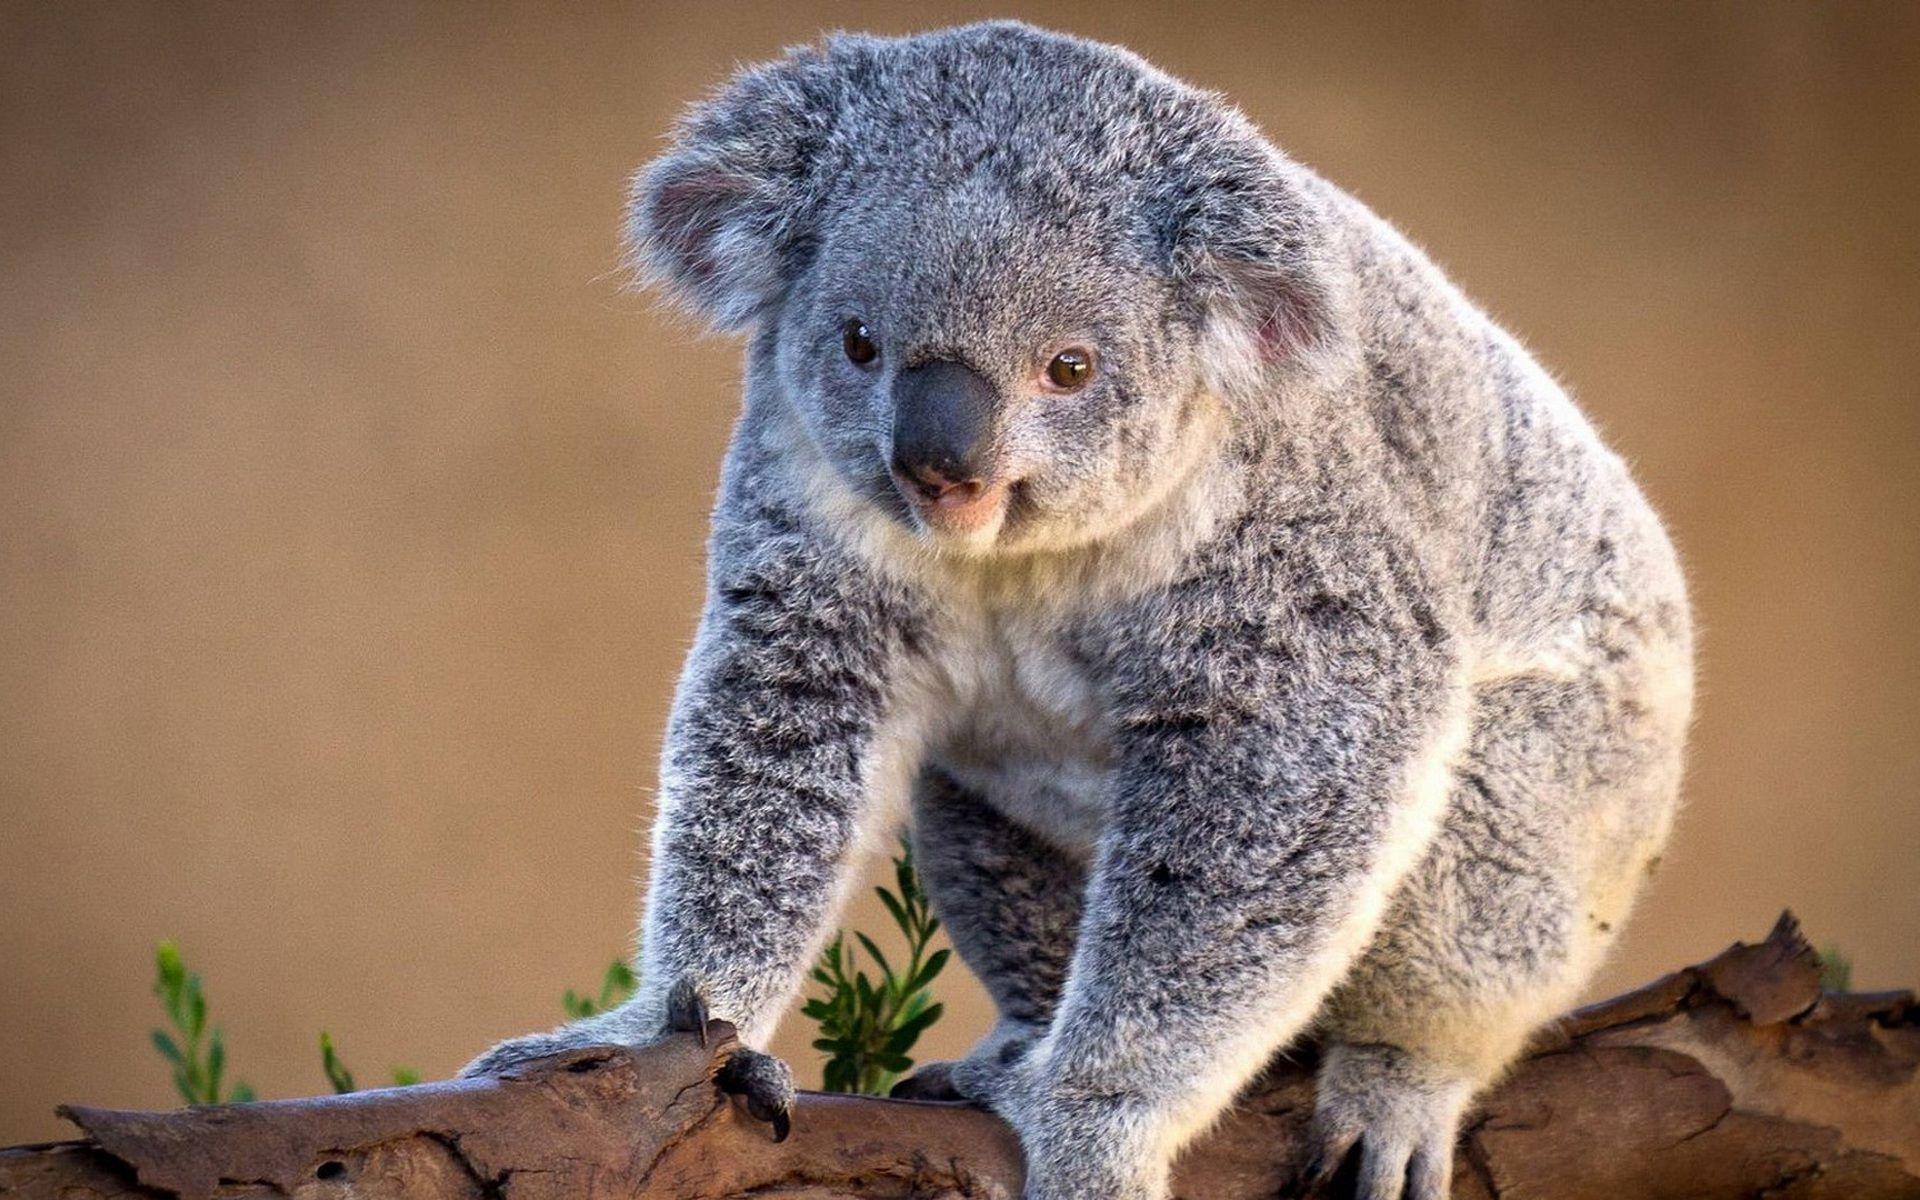 Koala Wallpaper For Computer